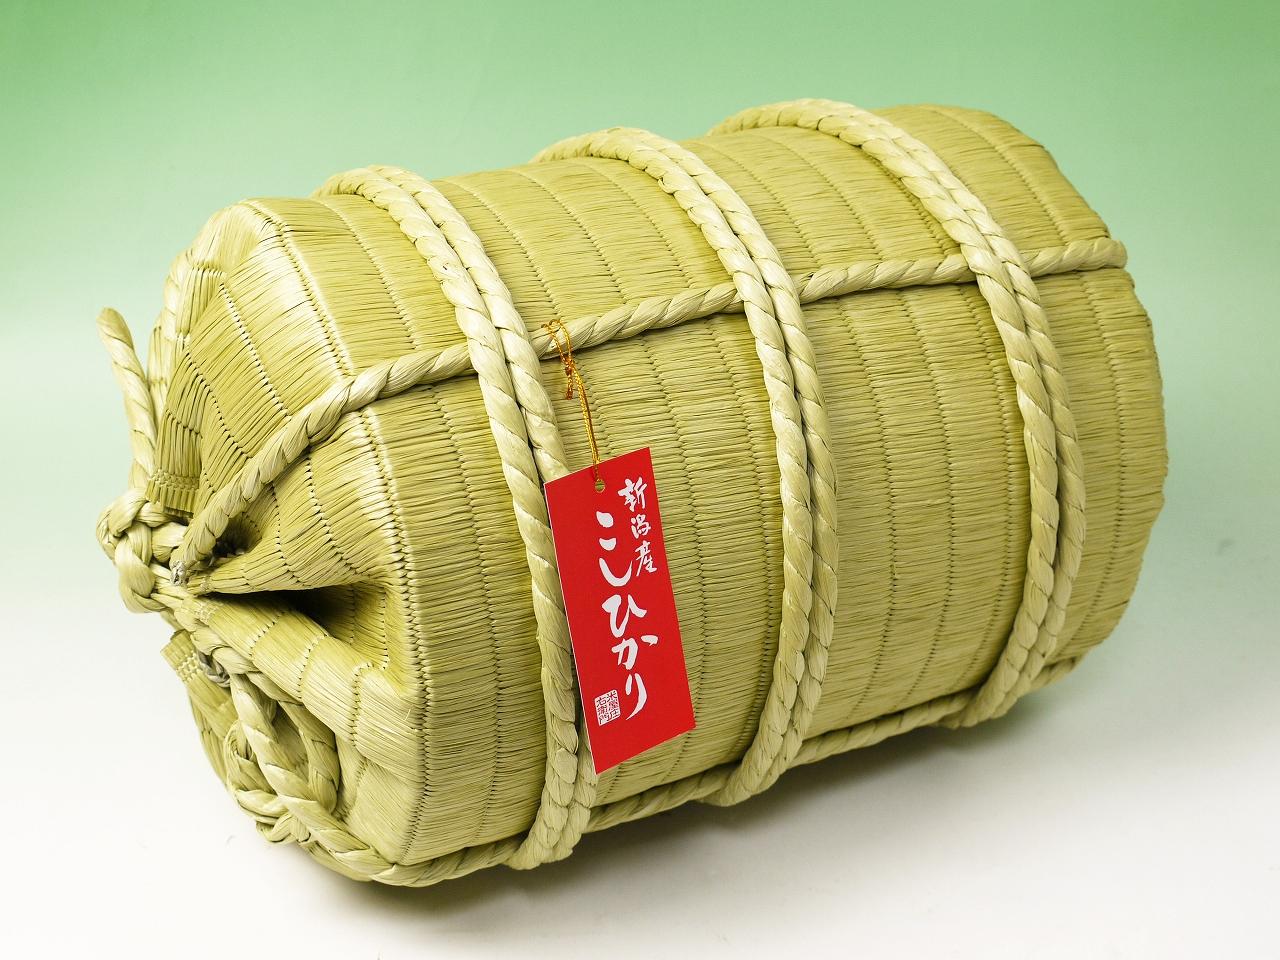 niigata_koshihikari_10kg.jpg